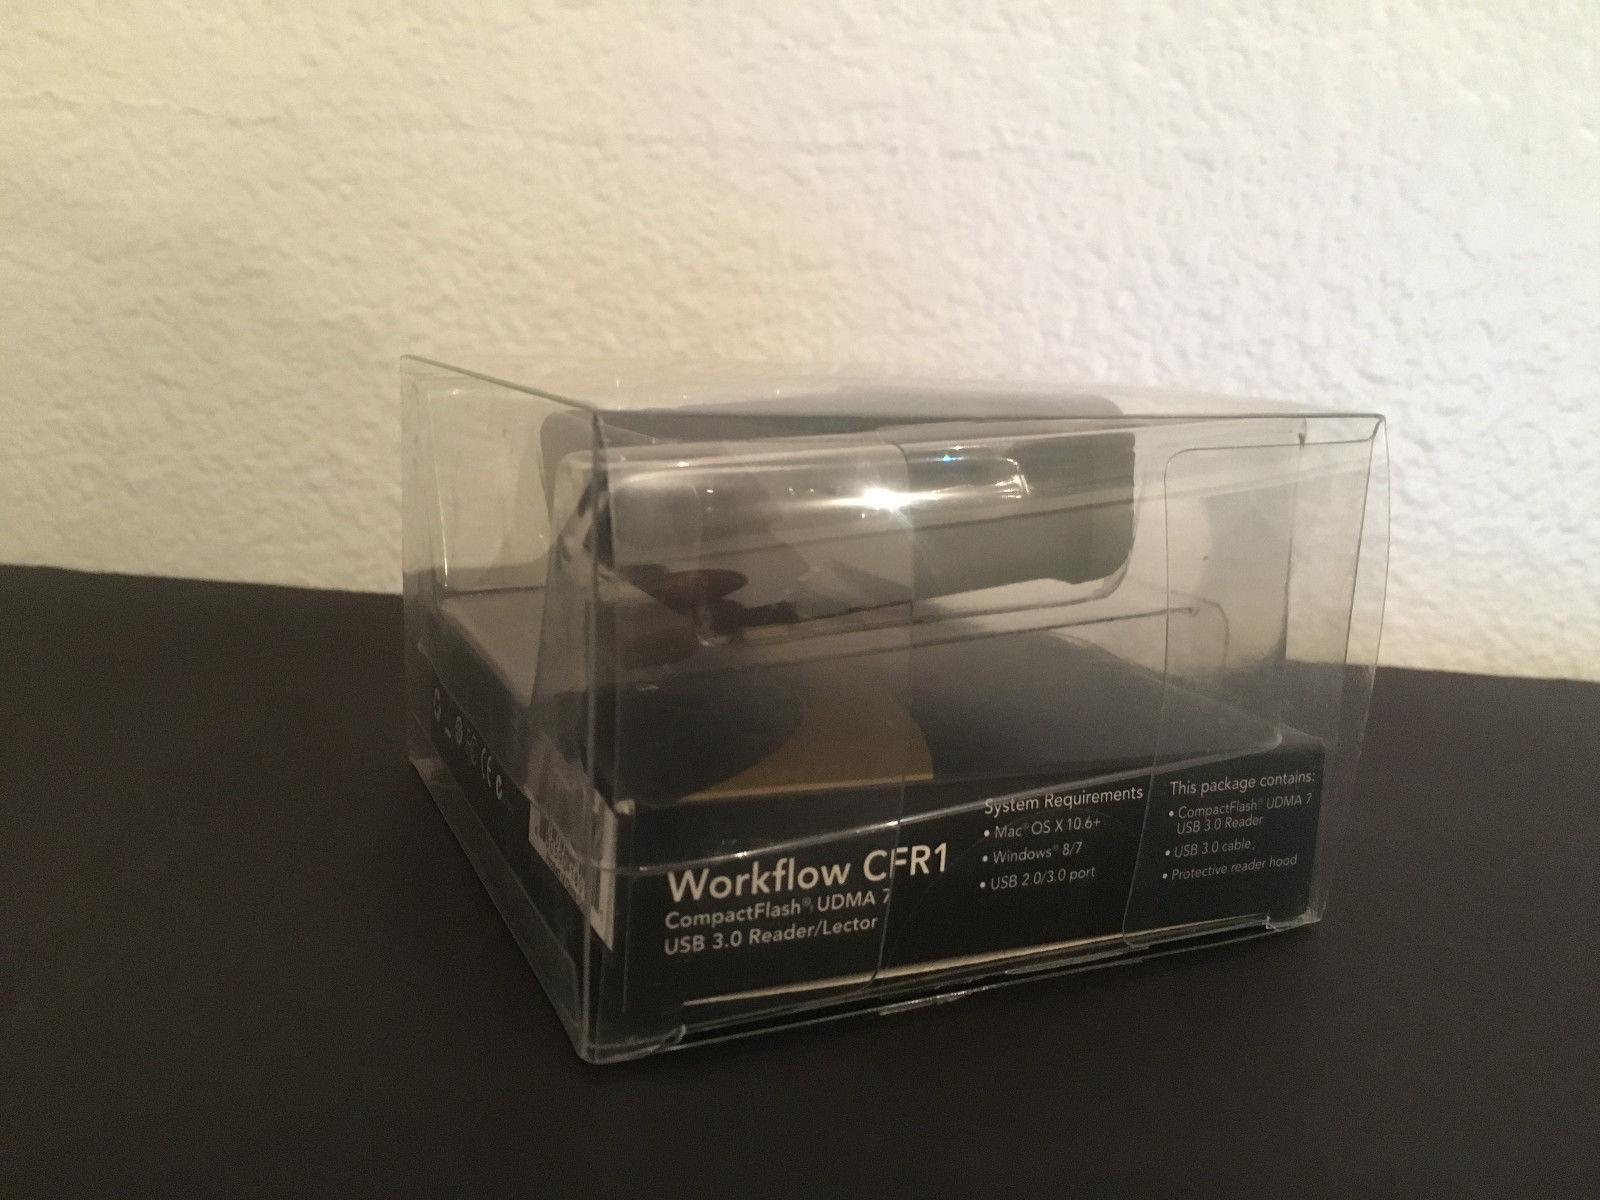 Lexar Professional Workflow CFR1 lector USB 3.0 CompactFlash